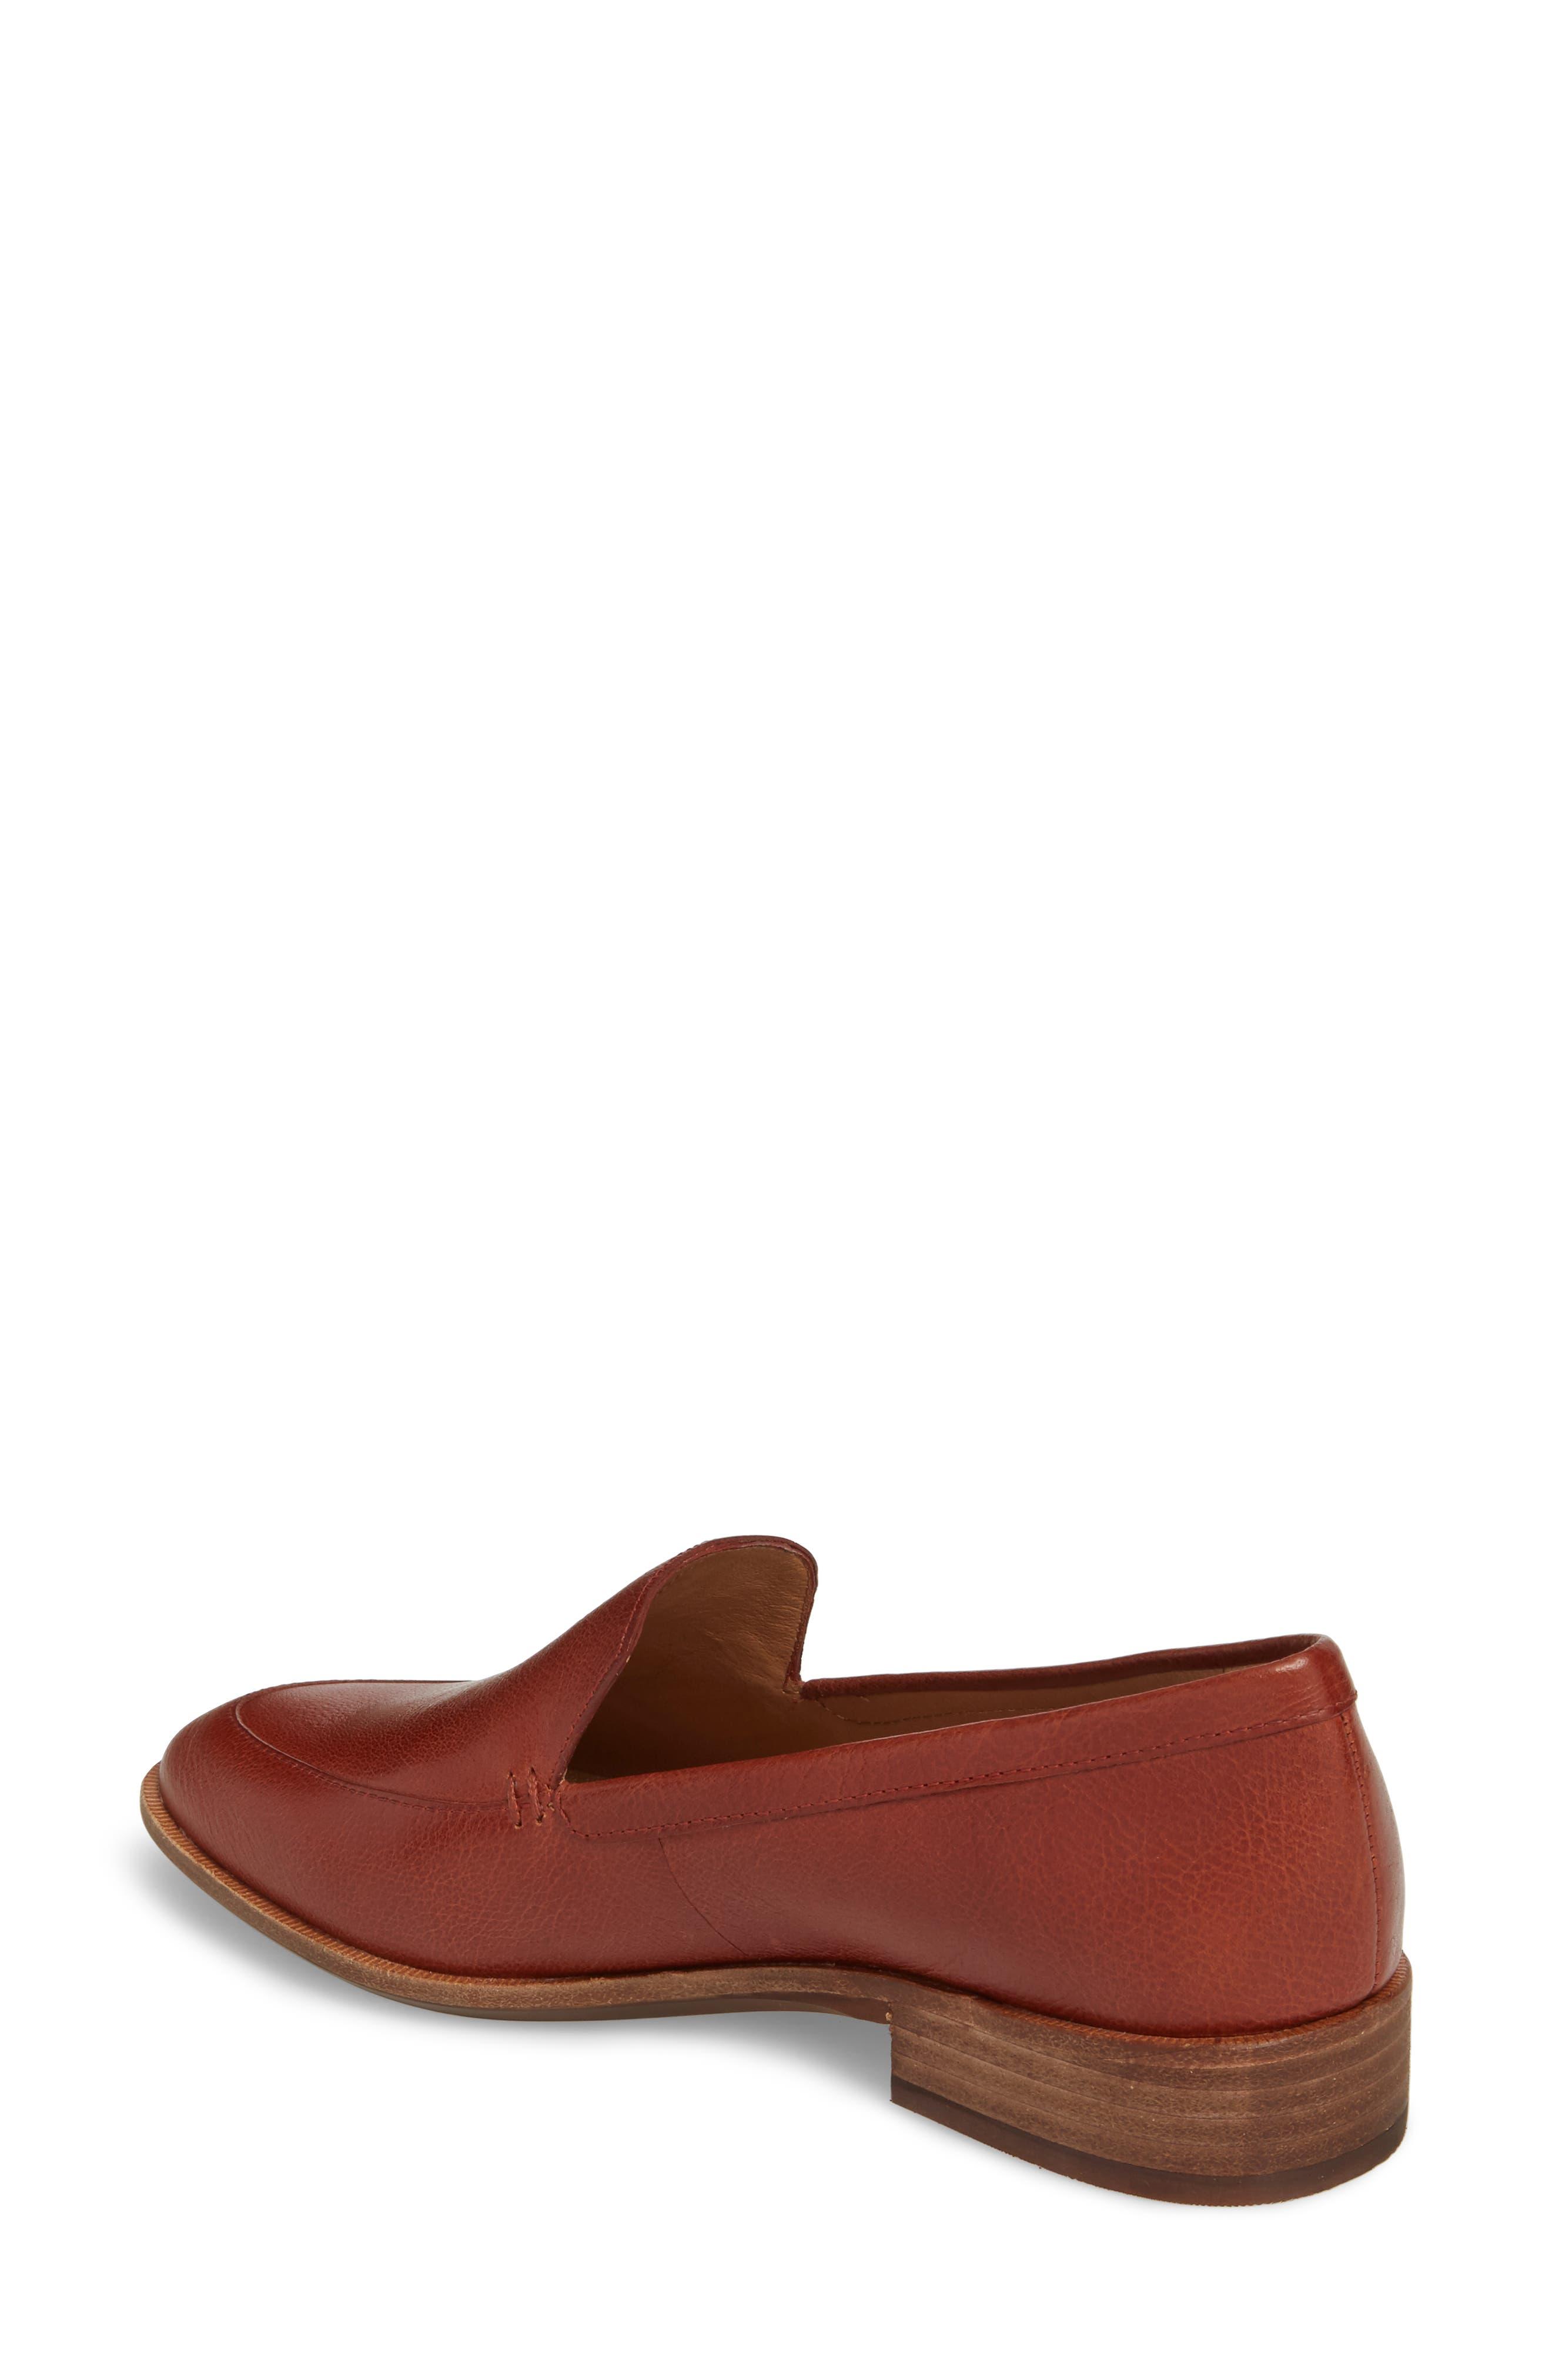 Frances Loafer,                             Alternate thumbnail 2, color,                             Burnished Mahogany Leather